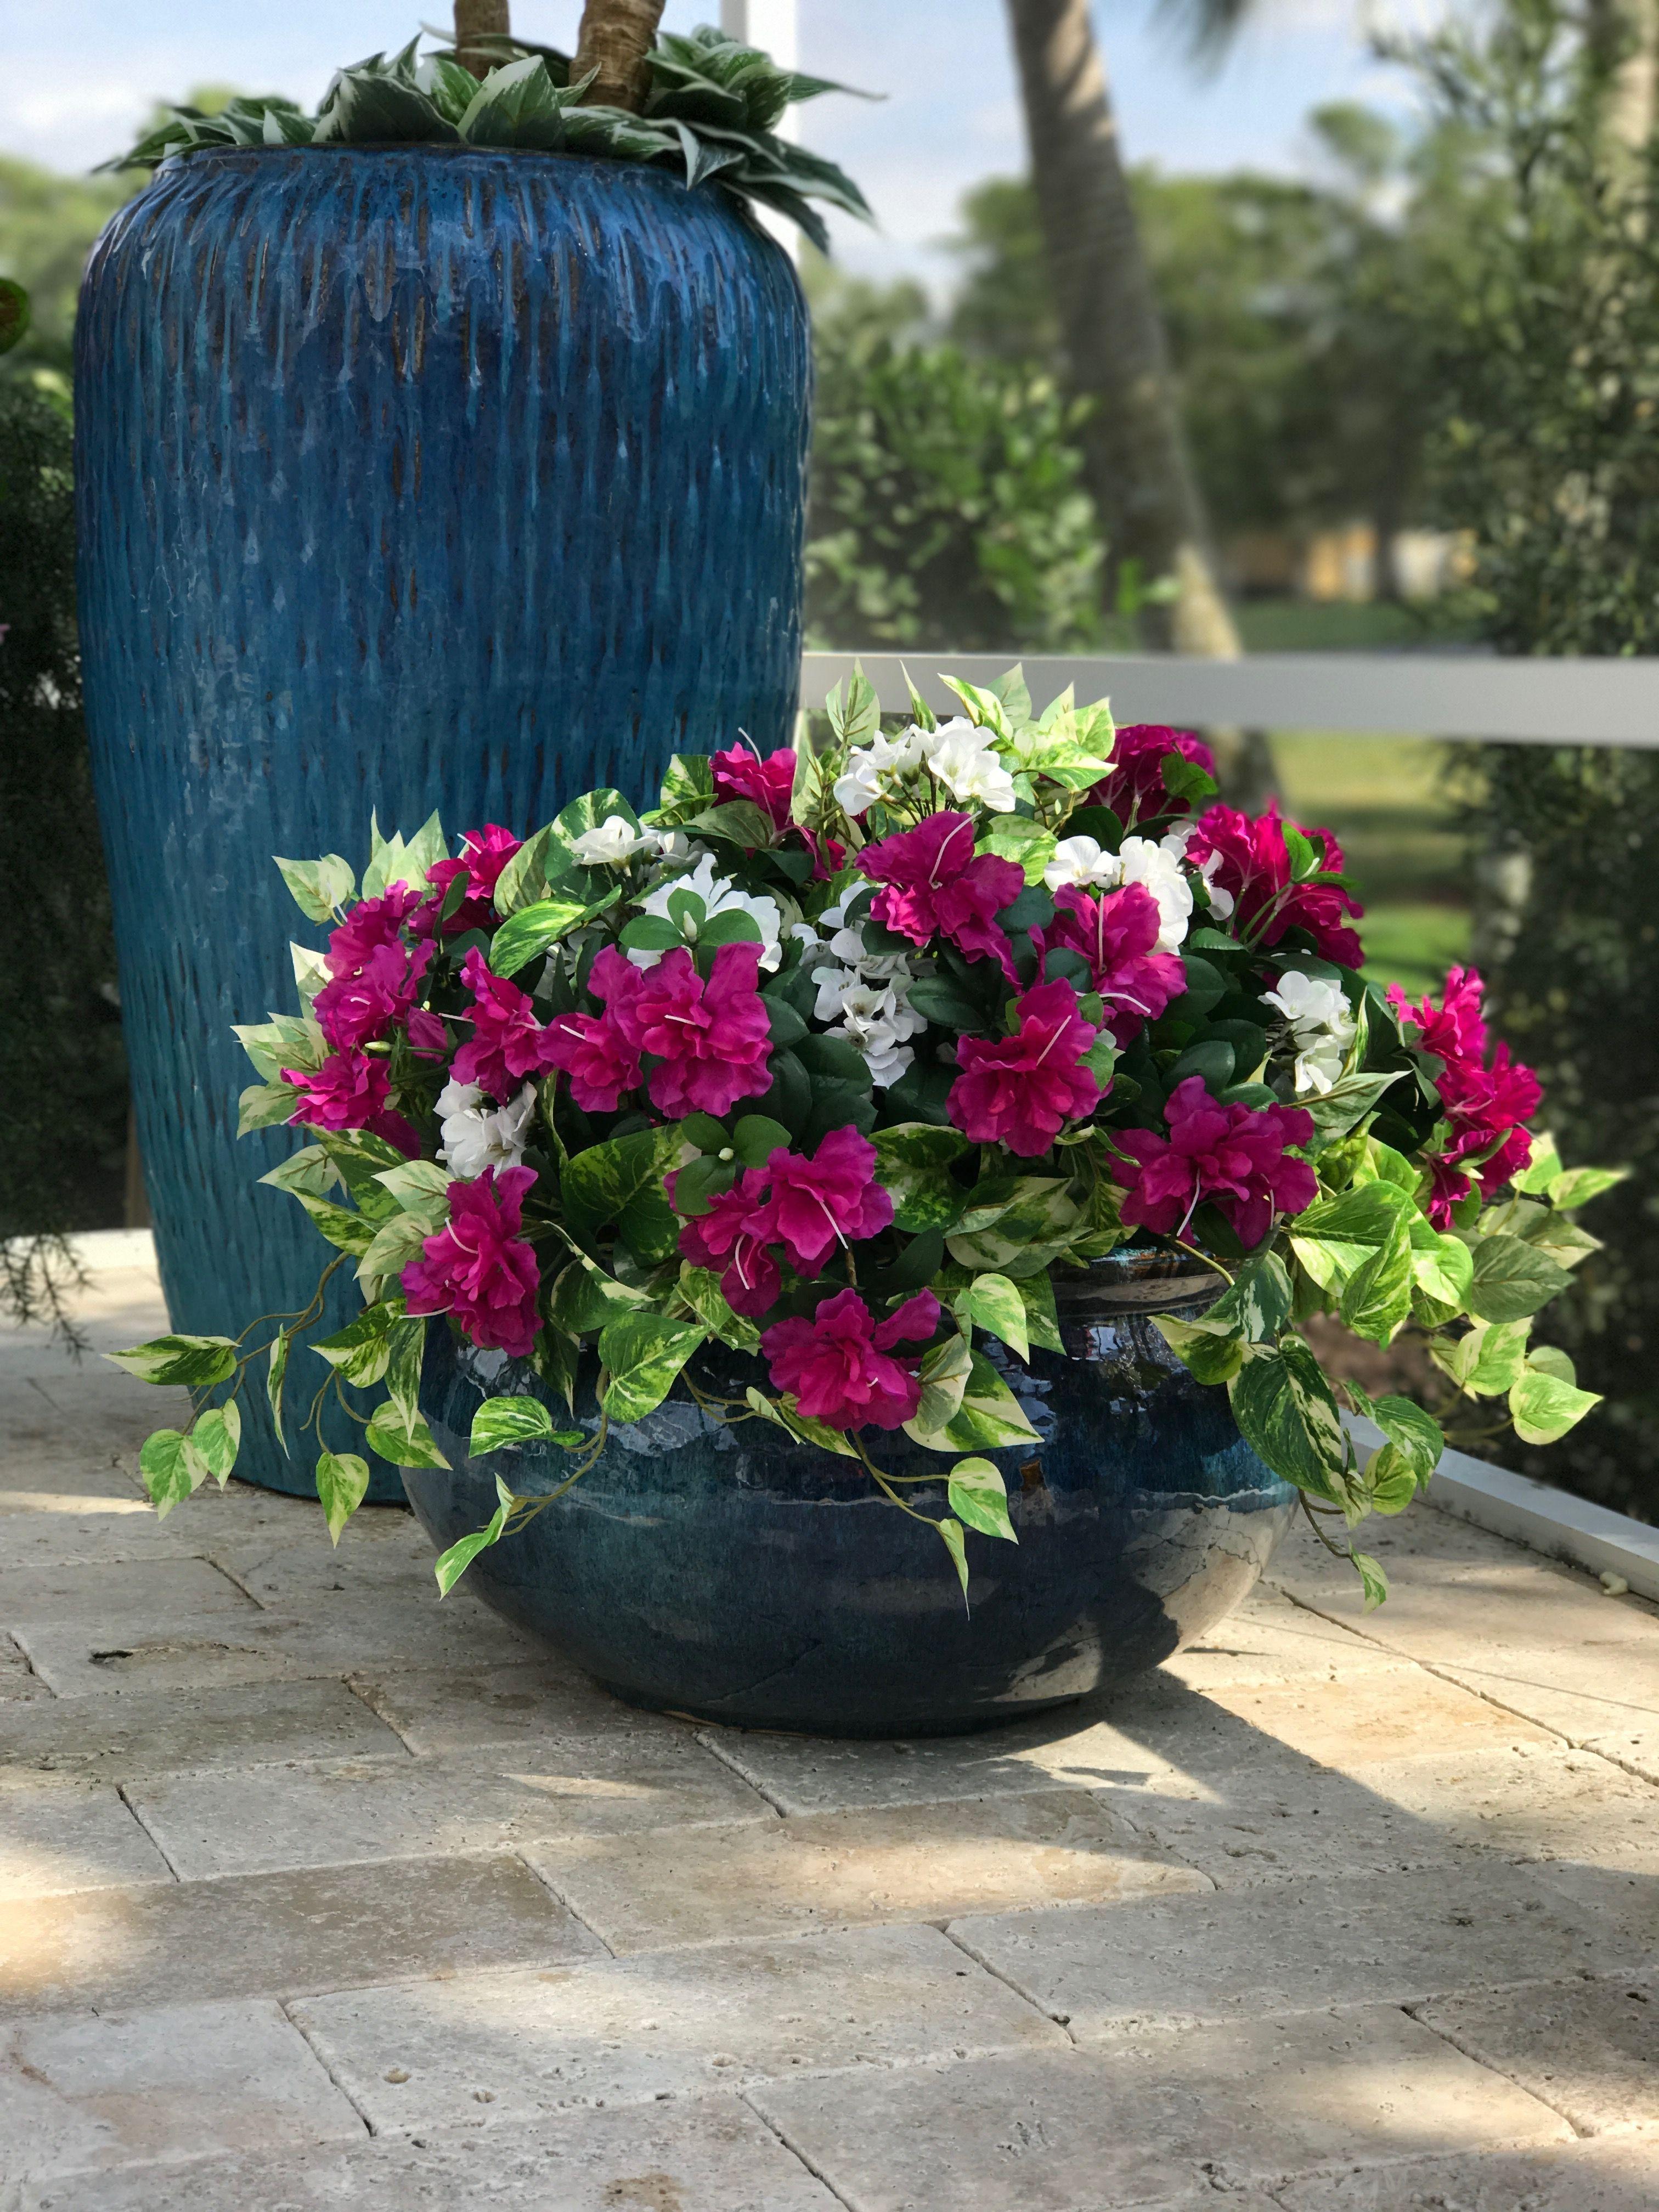 Wonderful Useful Tips Artificial Plants Outdoor House Small Artificial Plants Trees Artificial F Artificial Plants Outdoor Fake Plants Decor Artificial Plants